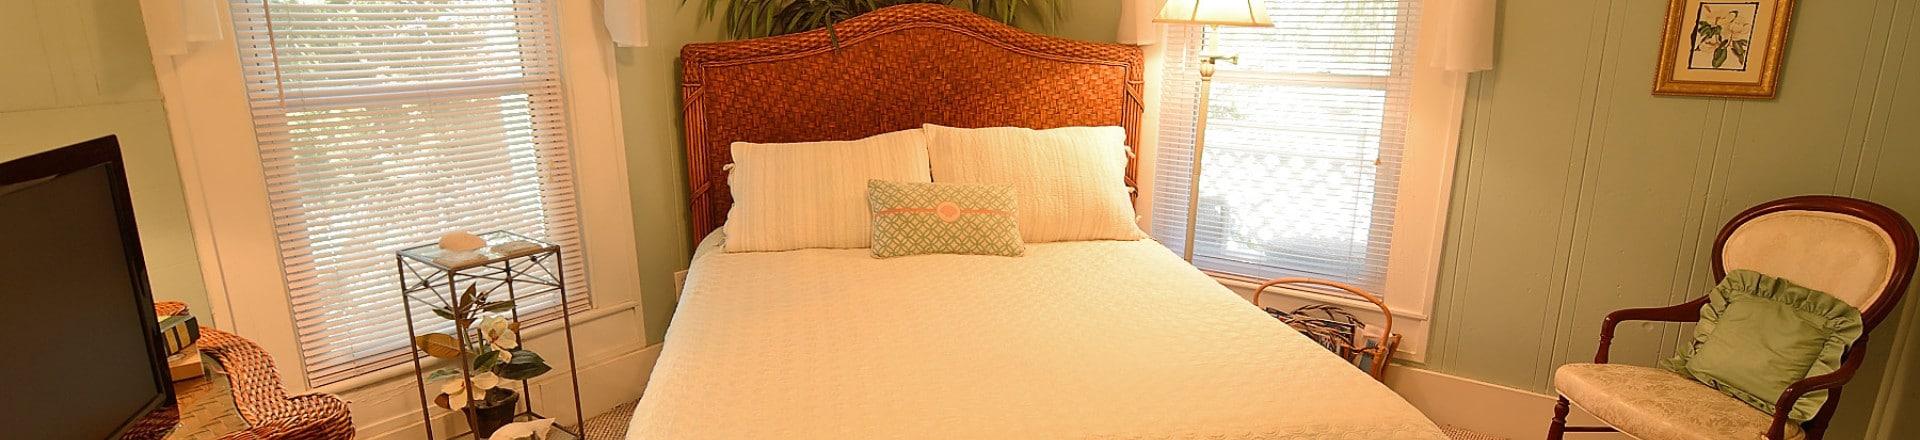 Magnolia Room at Old Carrabelle Hotel